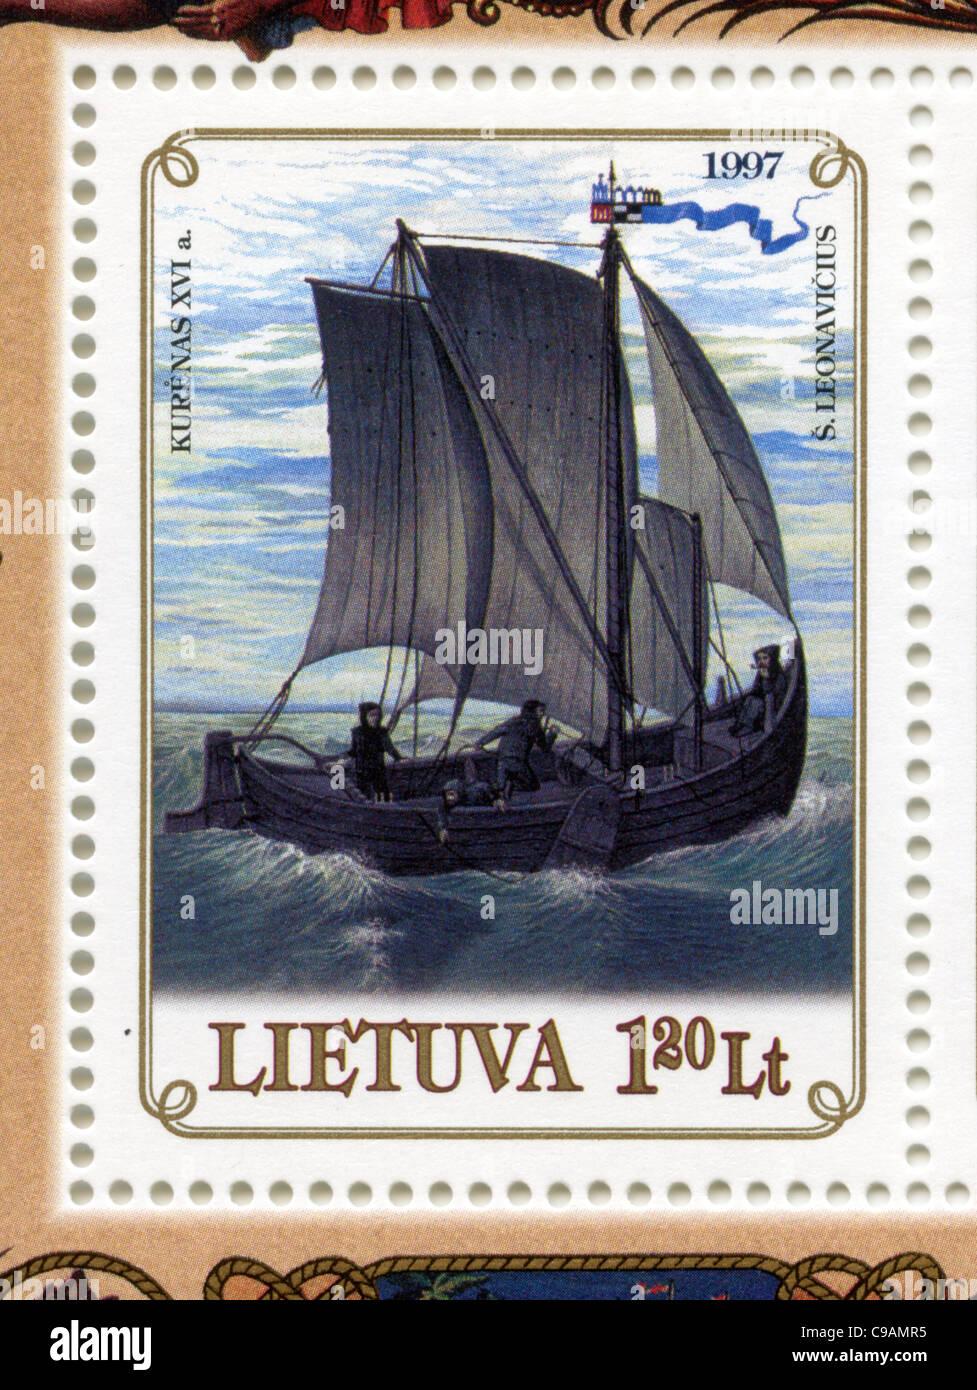 Lithuania postage stamp - Stock Image